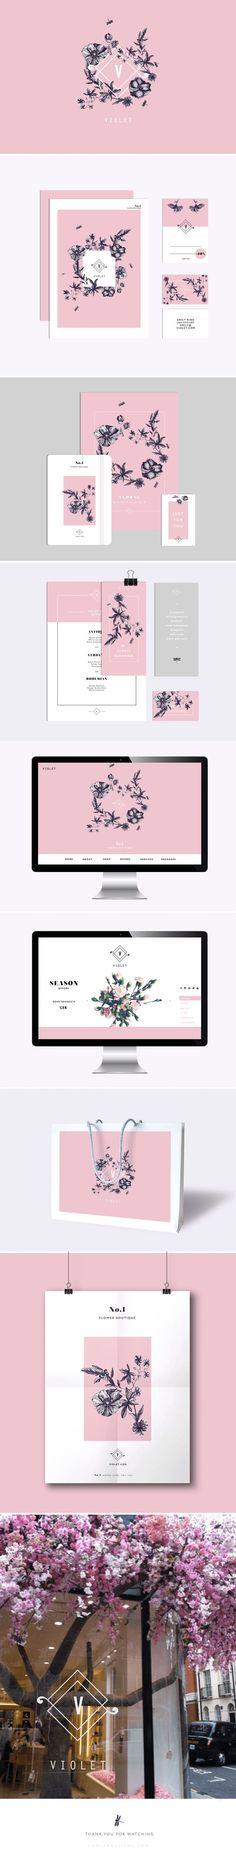 Violet Flower Boutique Branding   Fivestar Branding – Design and Branding Agency & Inspiration Gallery